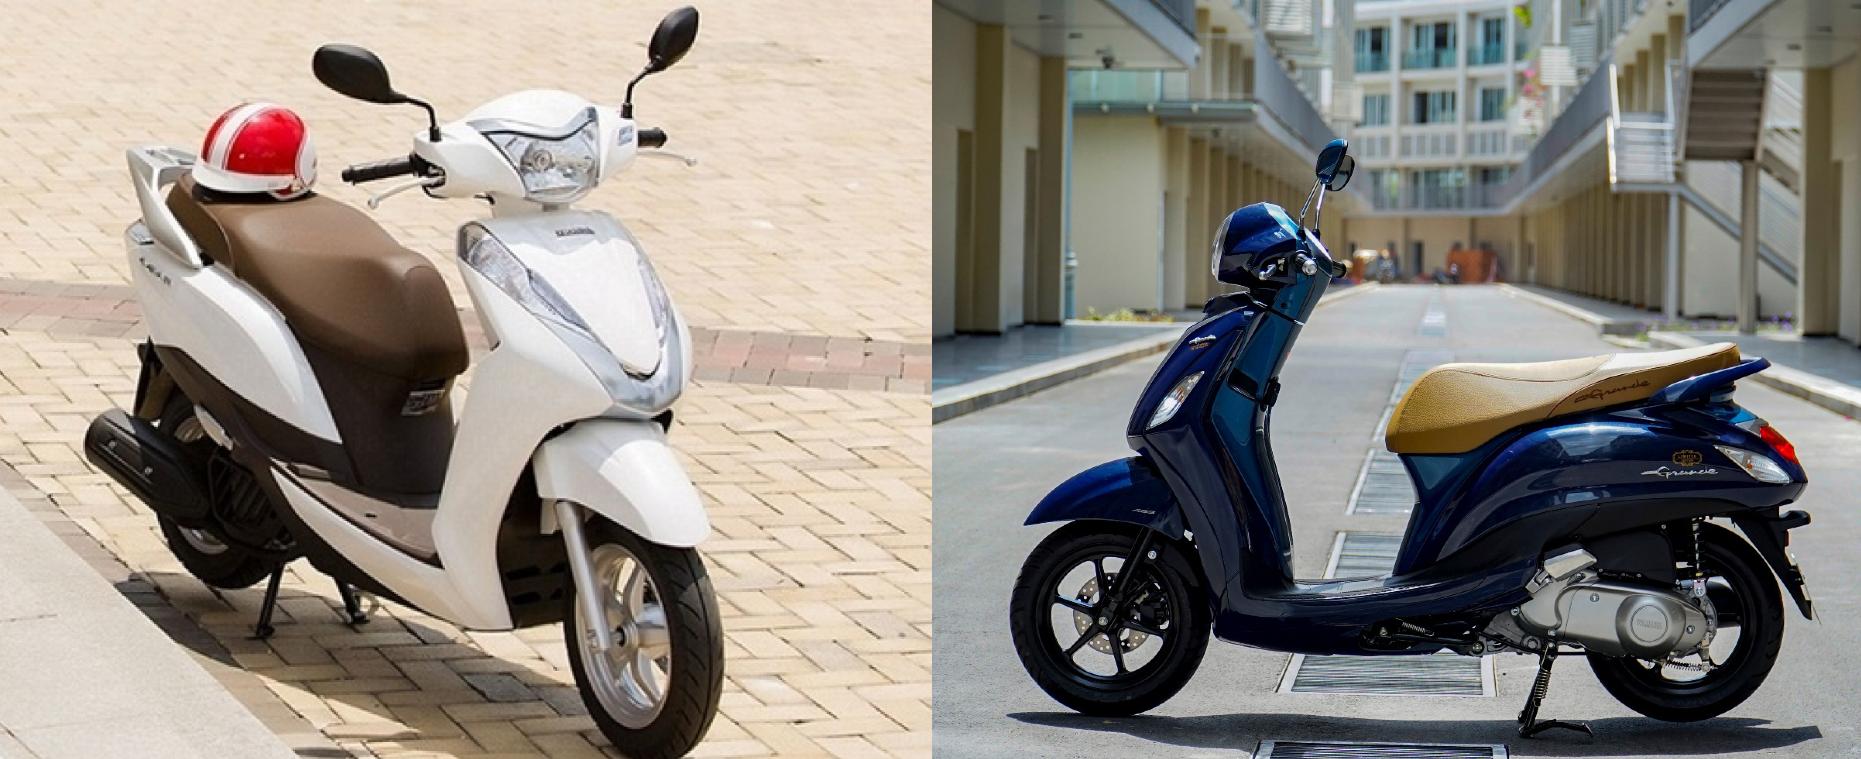 Xe tay ga 125cc cho nữ: Honda Lead hay Yamaha Grande